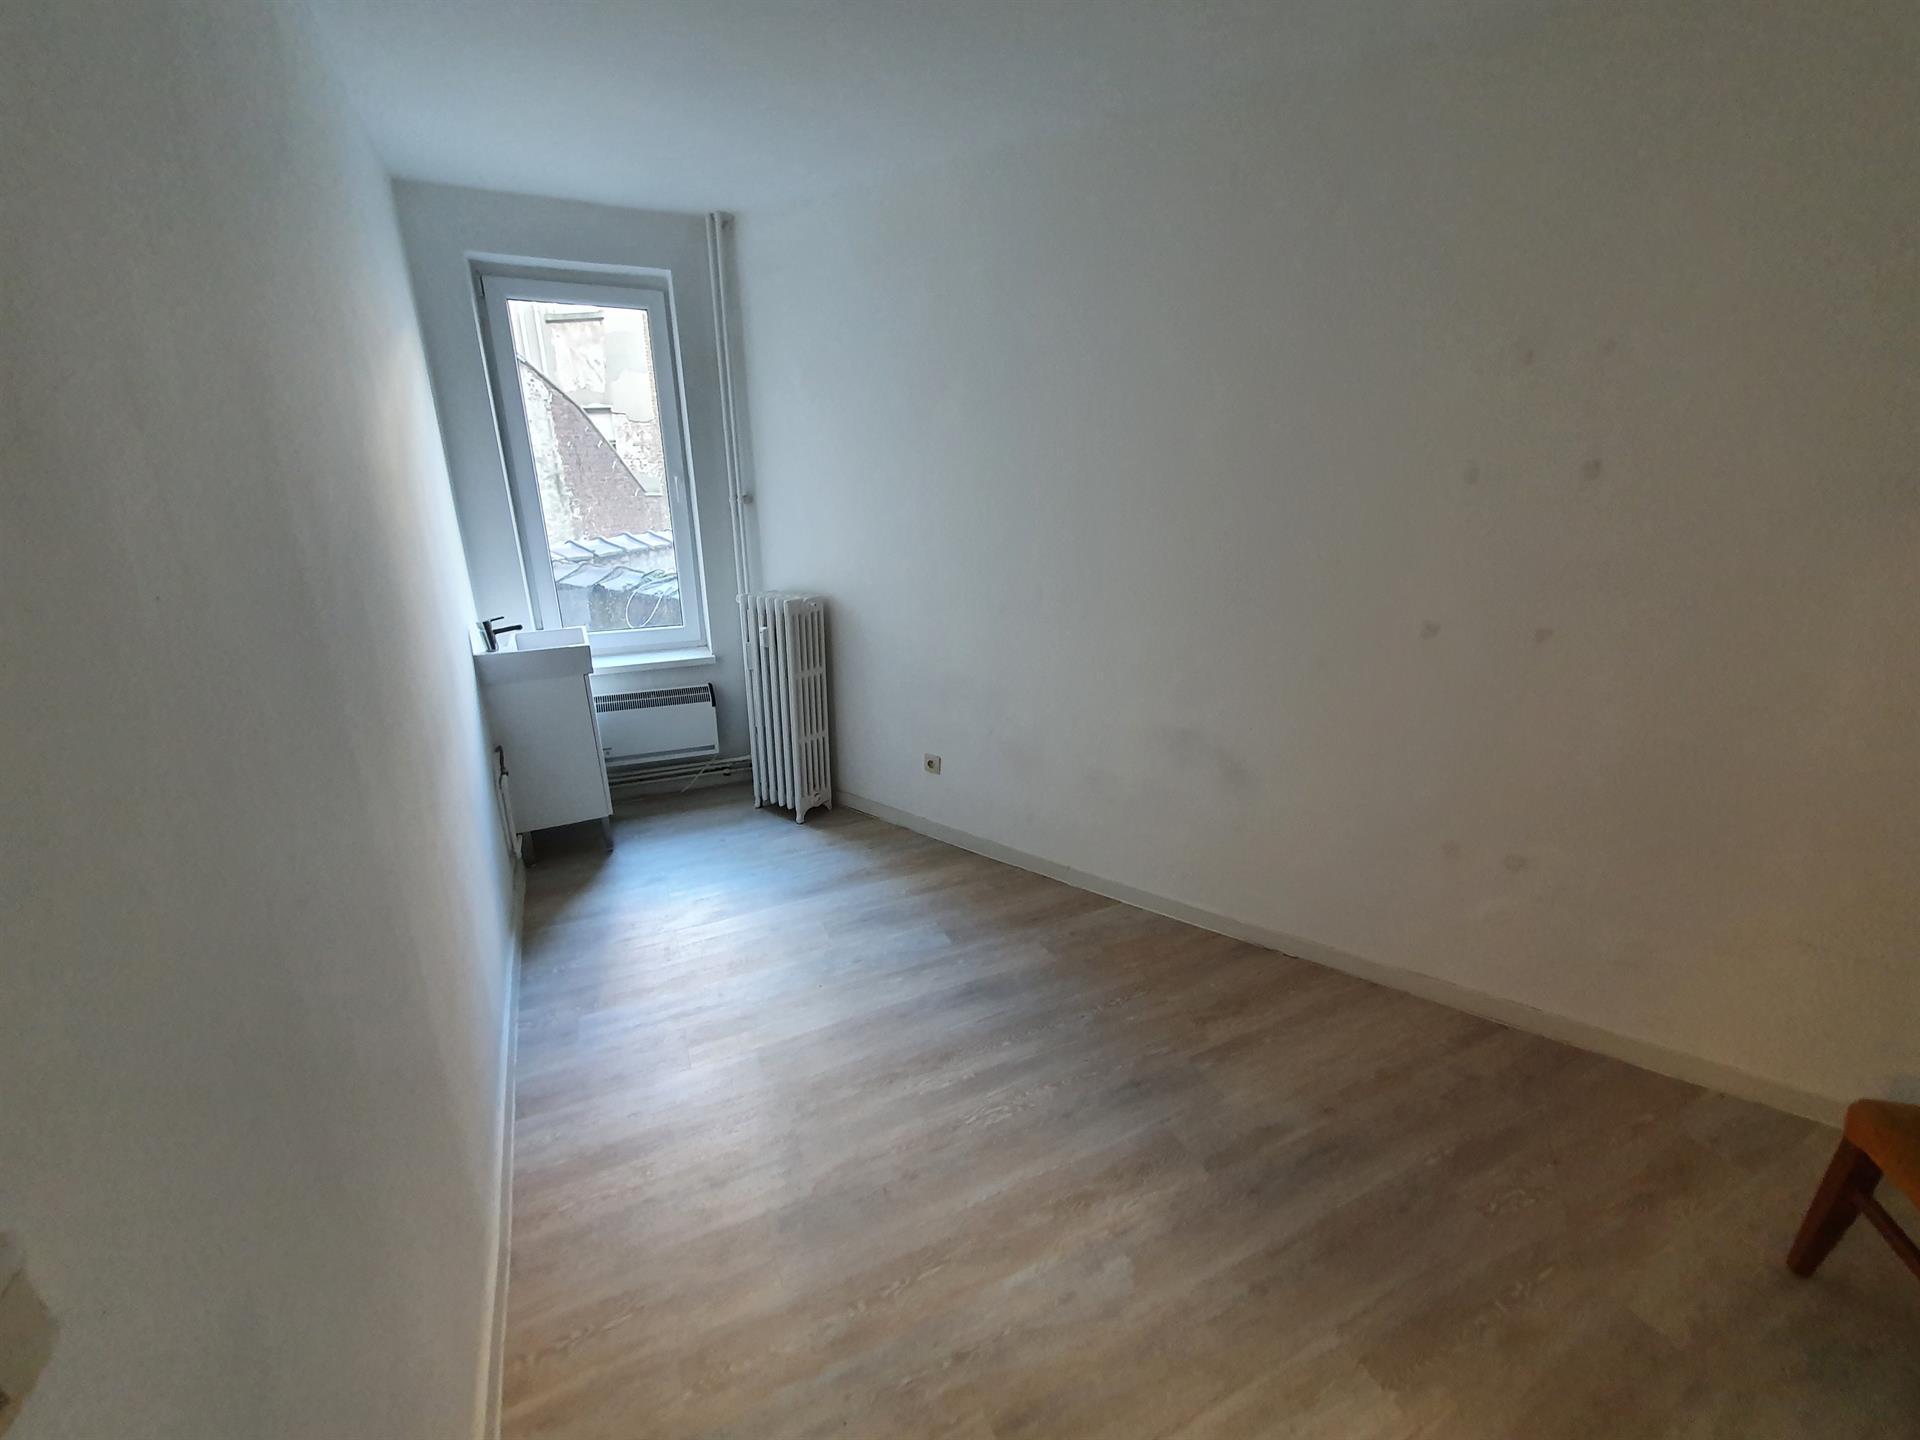 Appartement - Sint-Gillis - #4236948-8